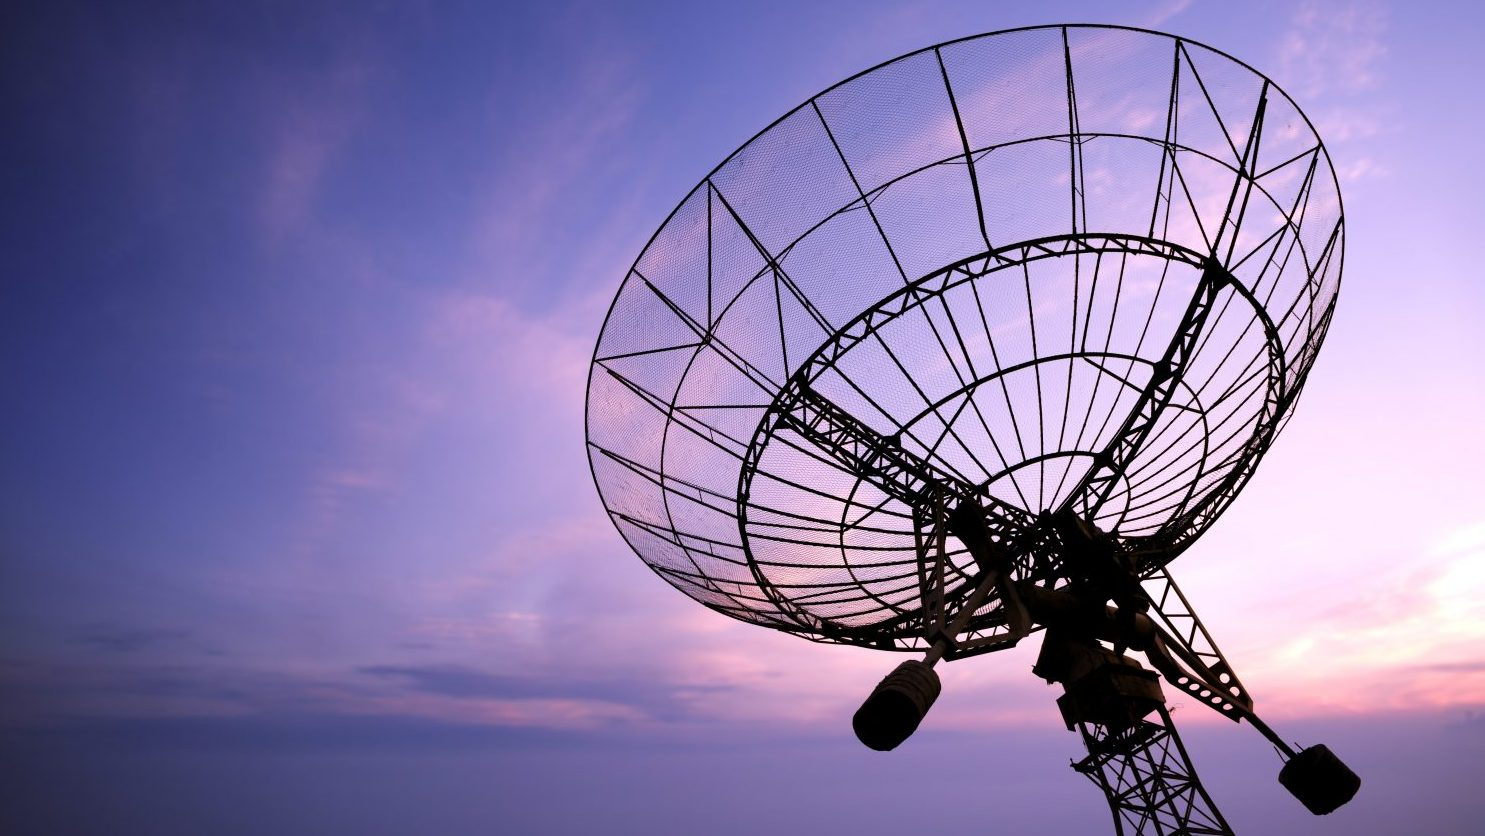 Communication Technology & Electronics